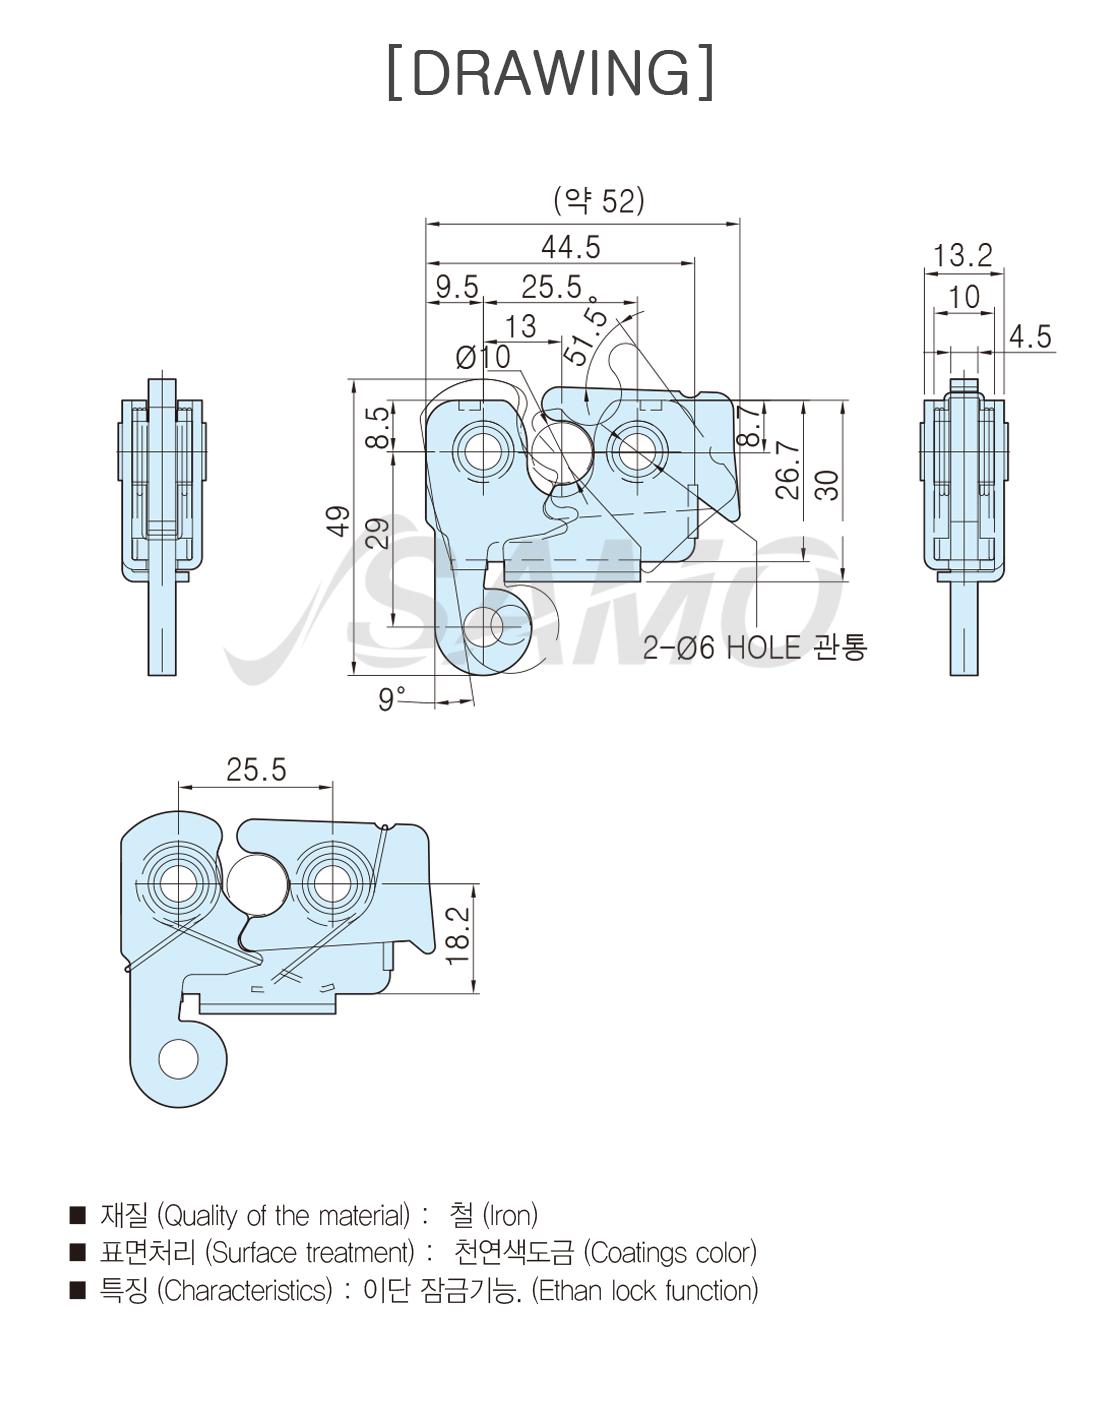 L009-2.jpg